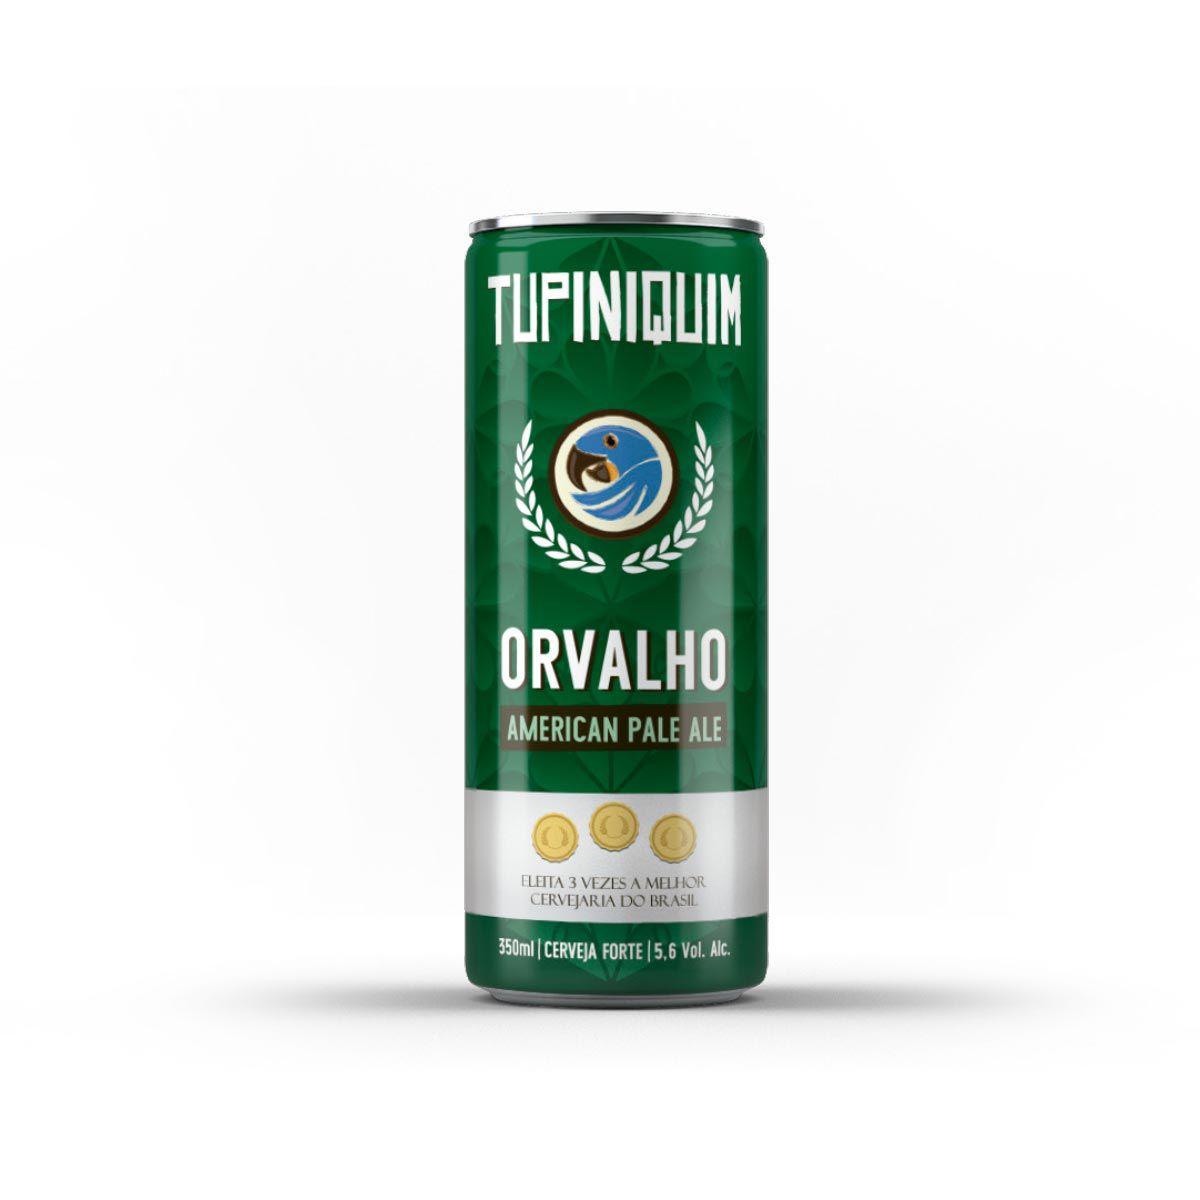 Tupiniquim American Pale Ale Orvalho 350ml